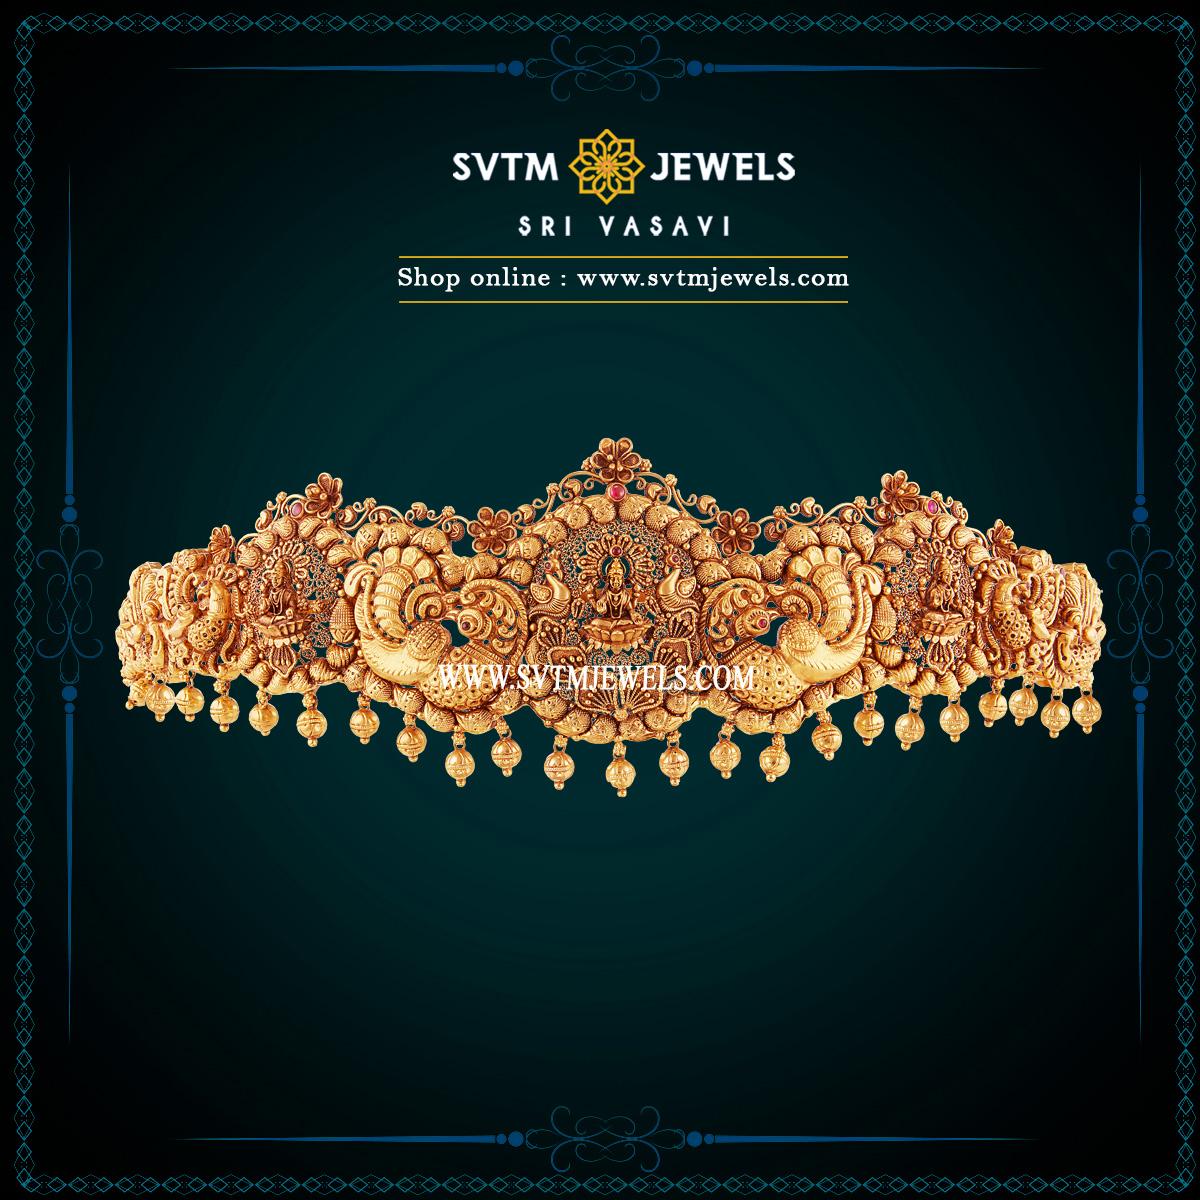 vaddanam-ottiyanam-hip-belt-designs (7)